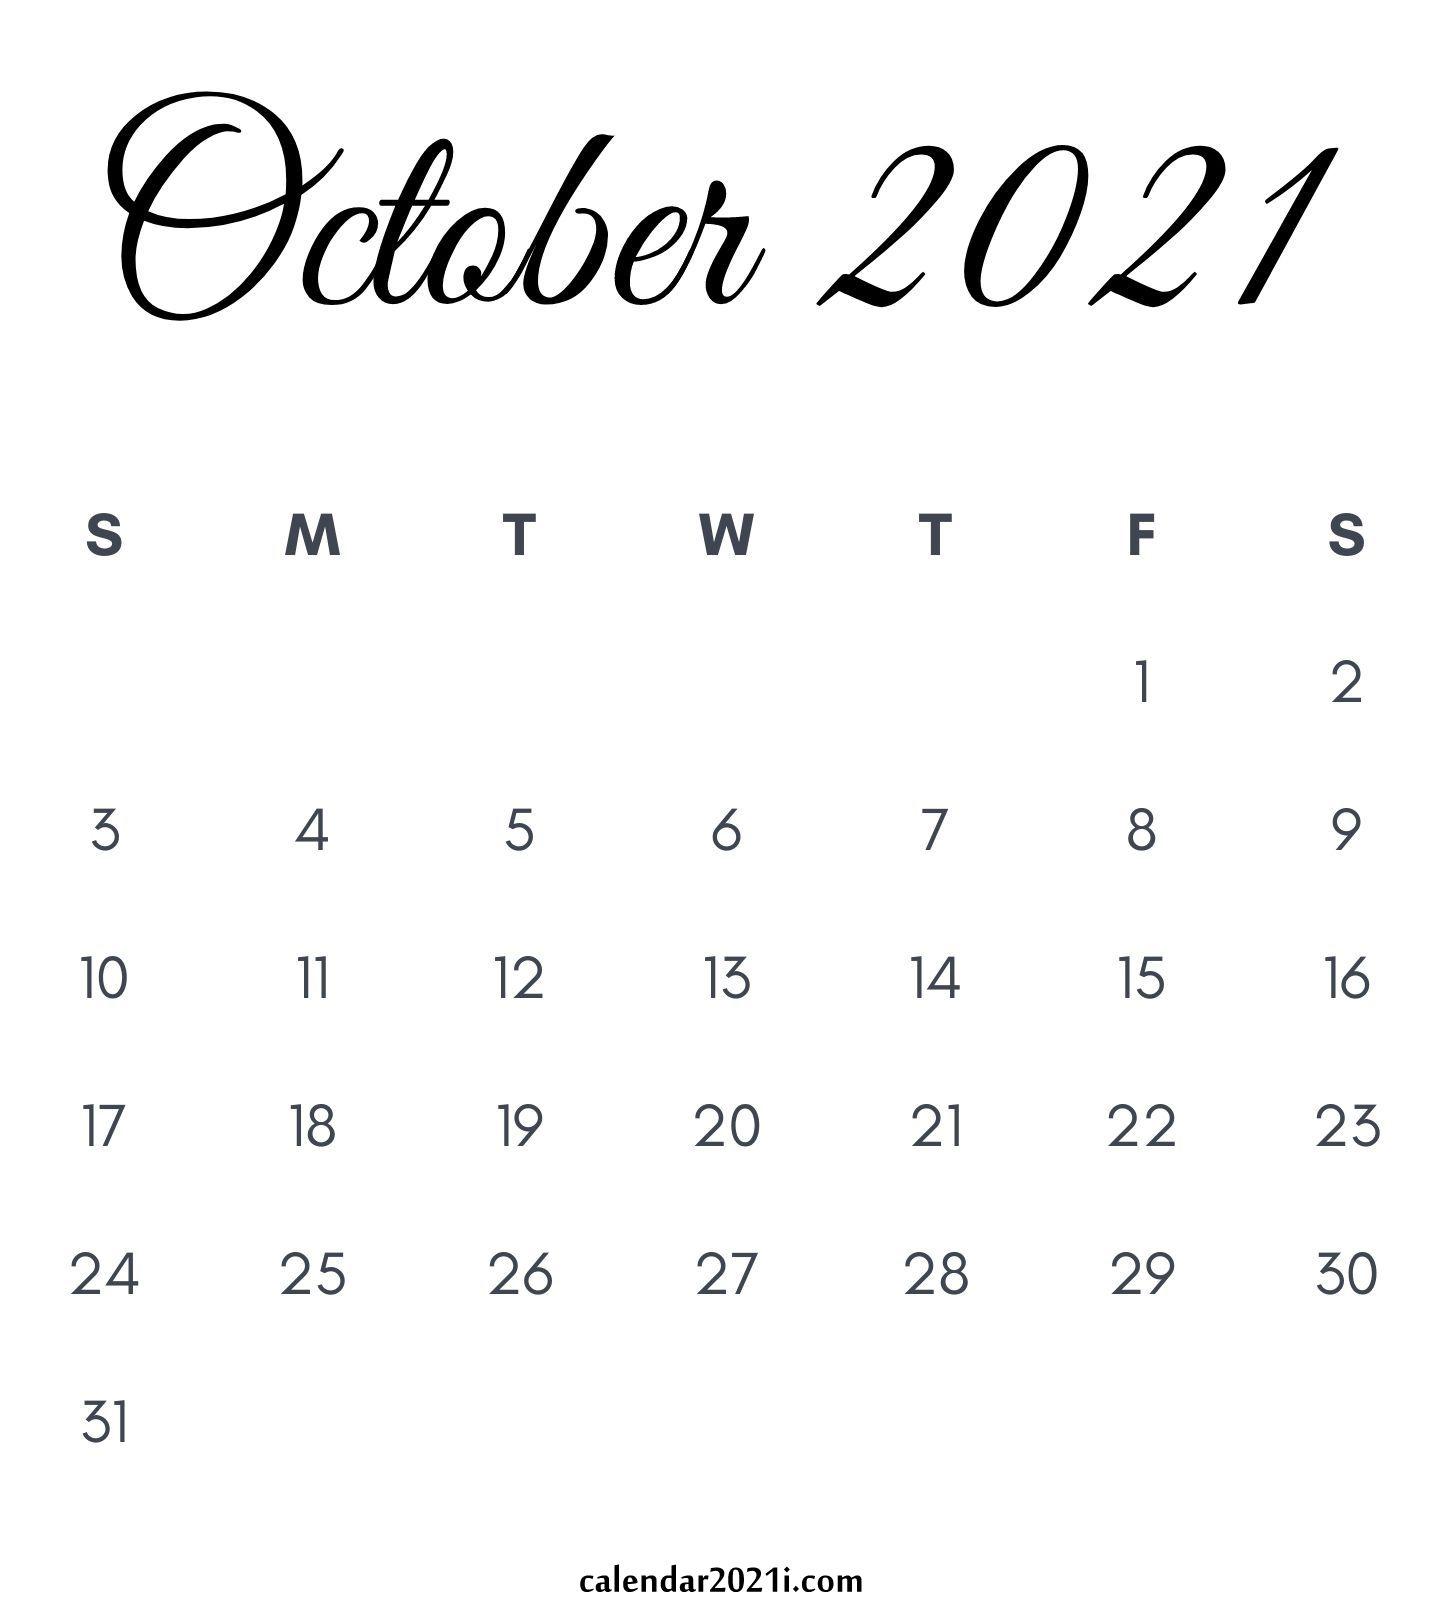 2021 Calendar Monthly Printable | Calendar 2021